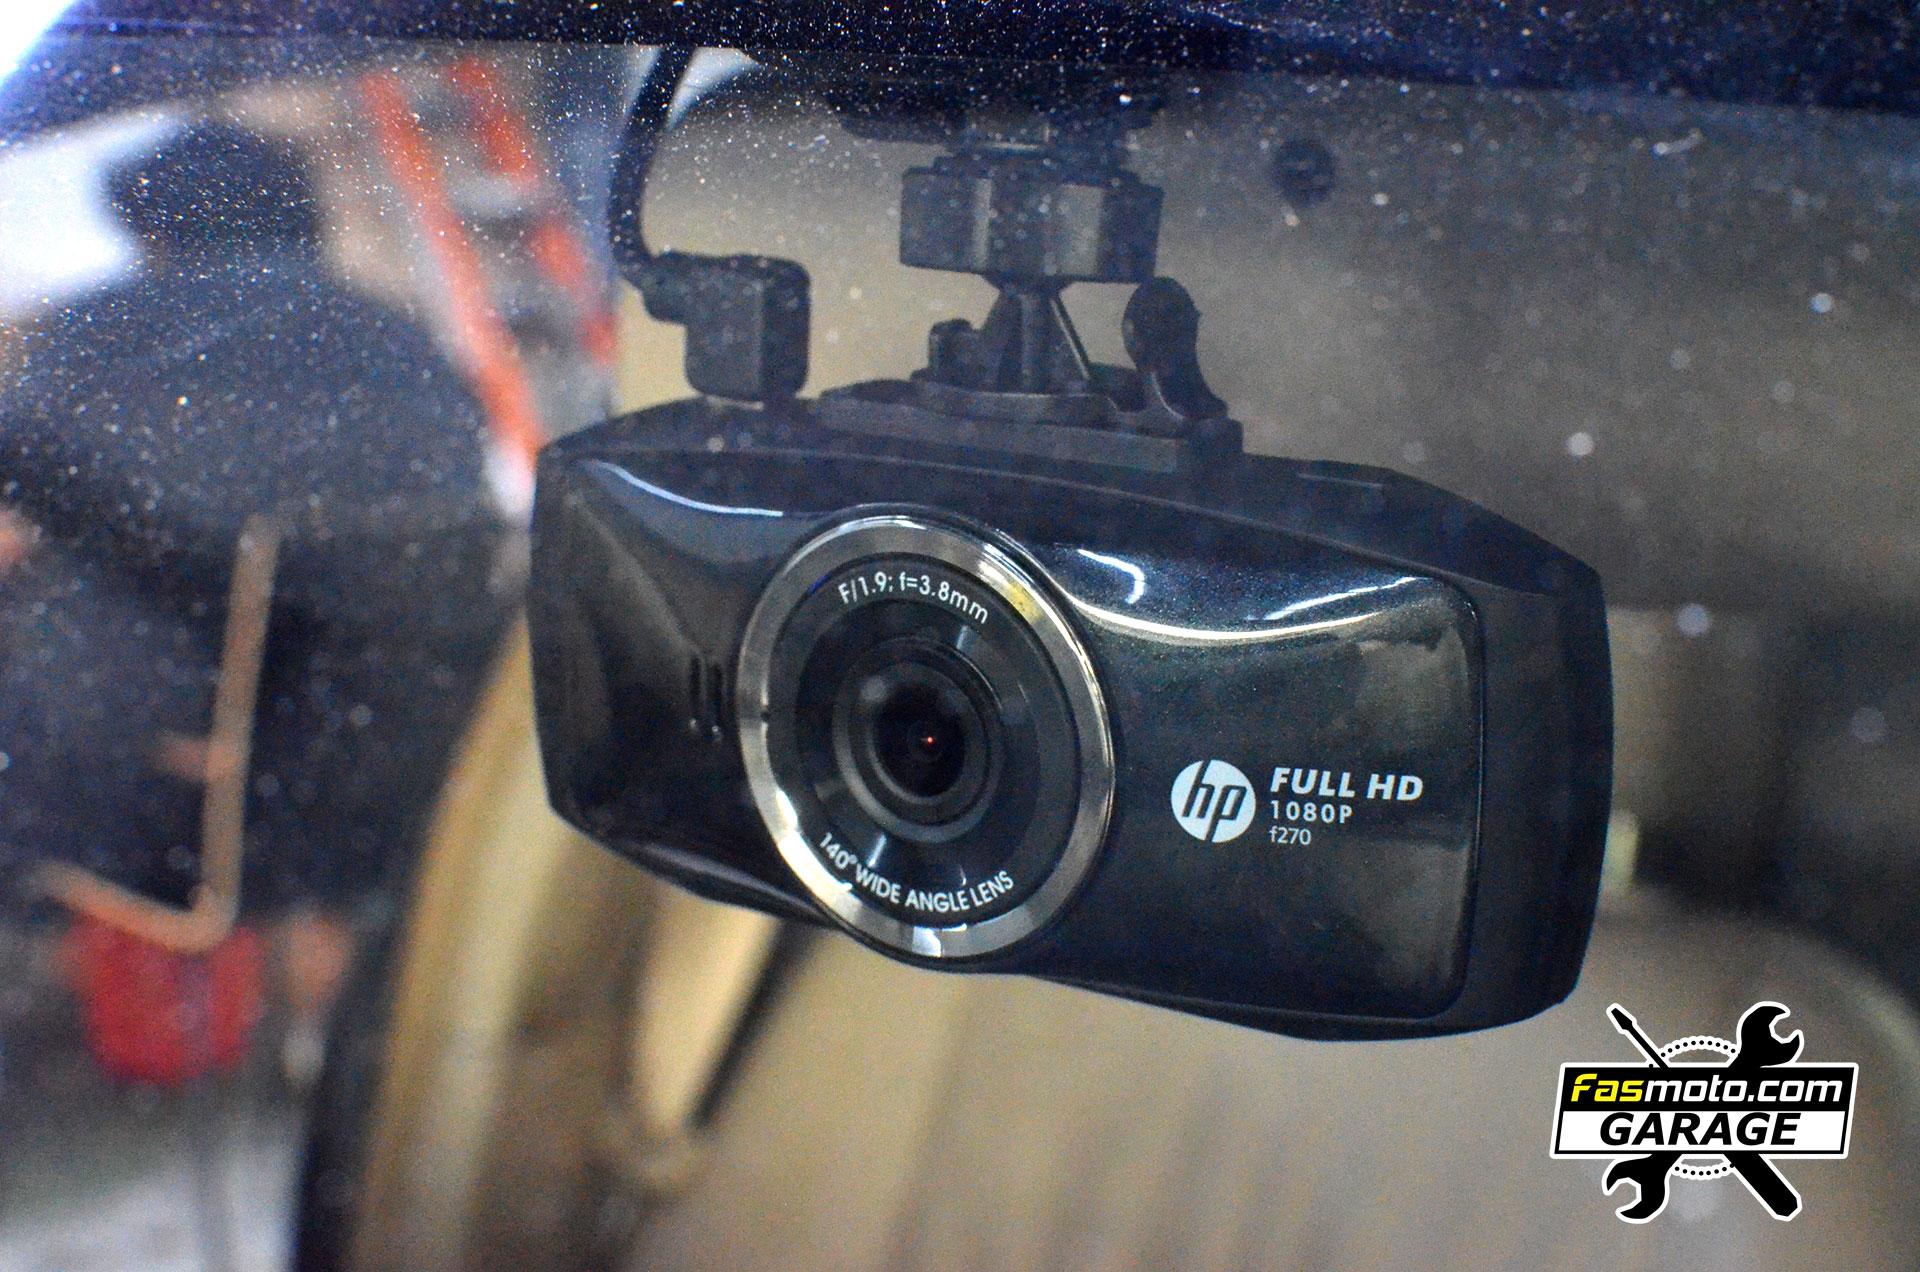 Toyota Corolla Altis 9th Gen Sony XAV-AX3000 and HP Dash Cam Install